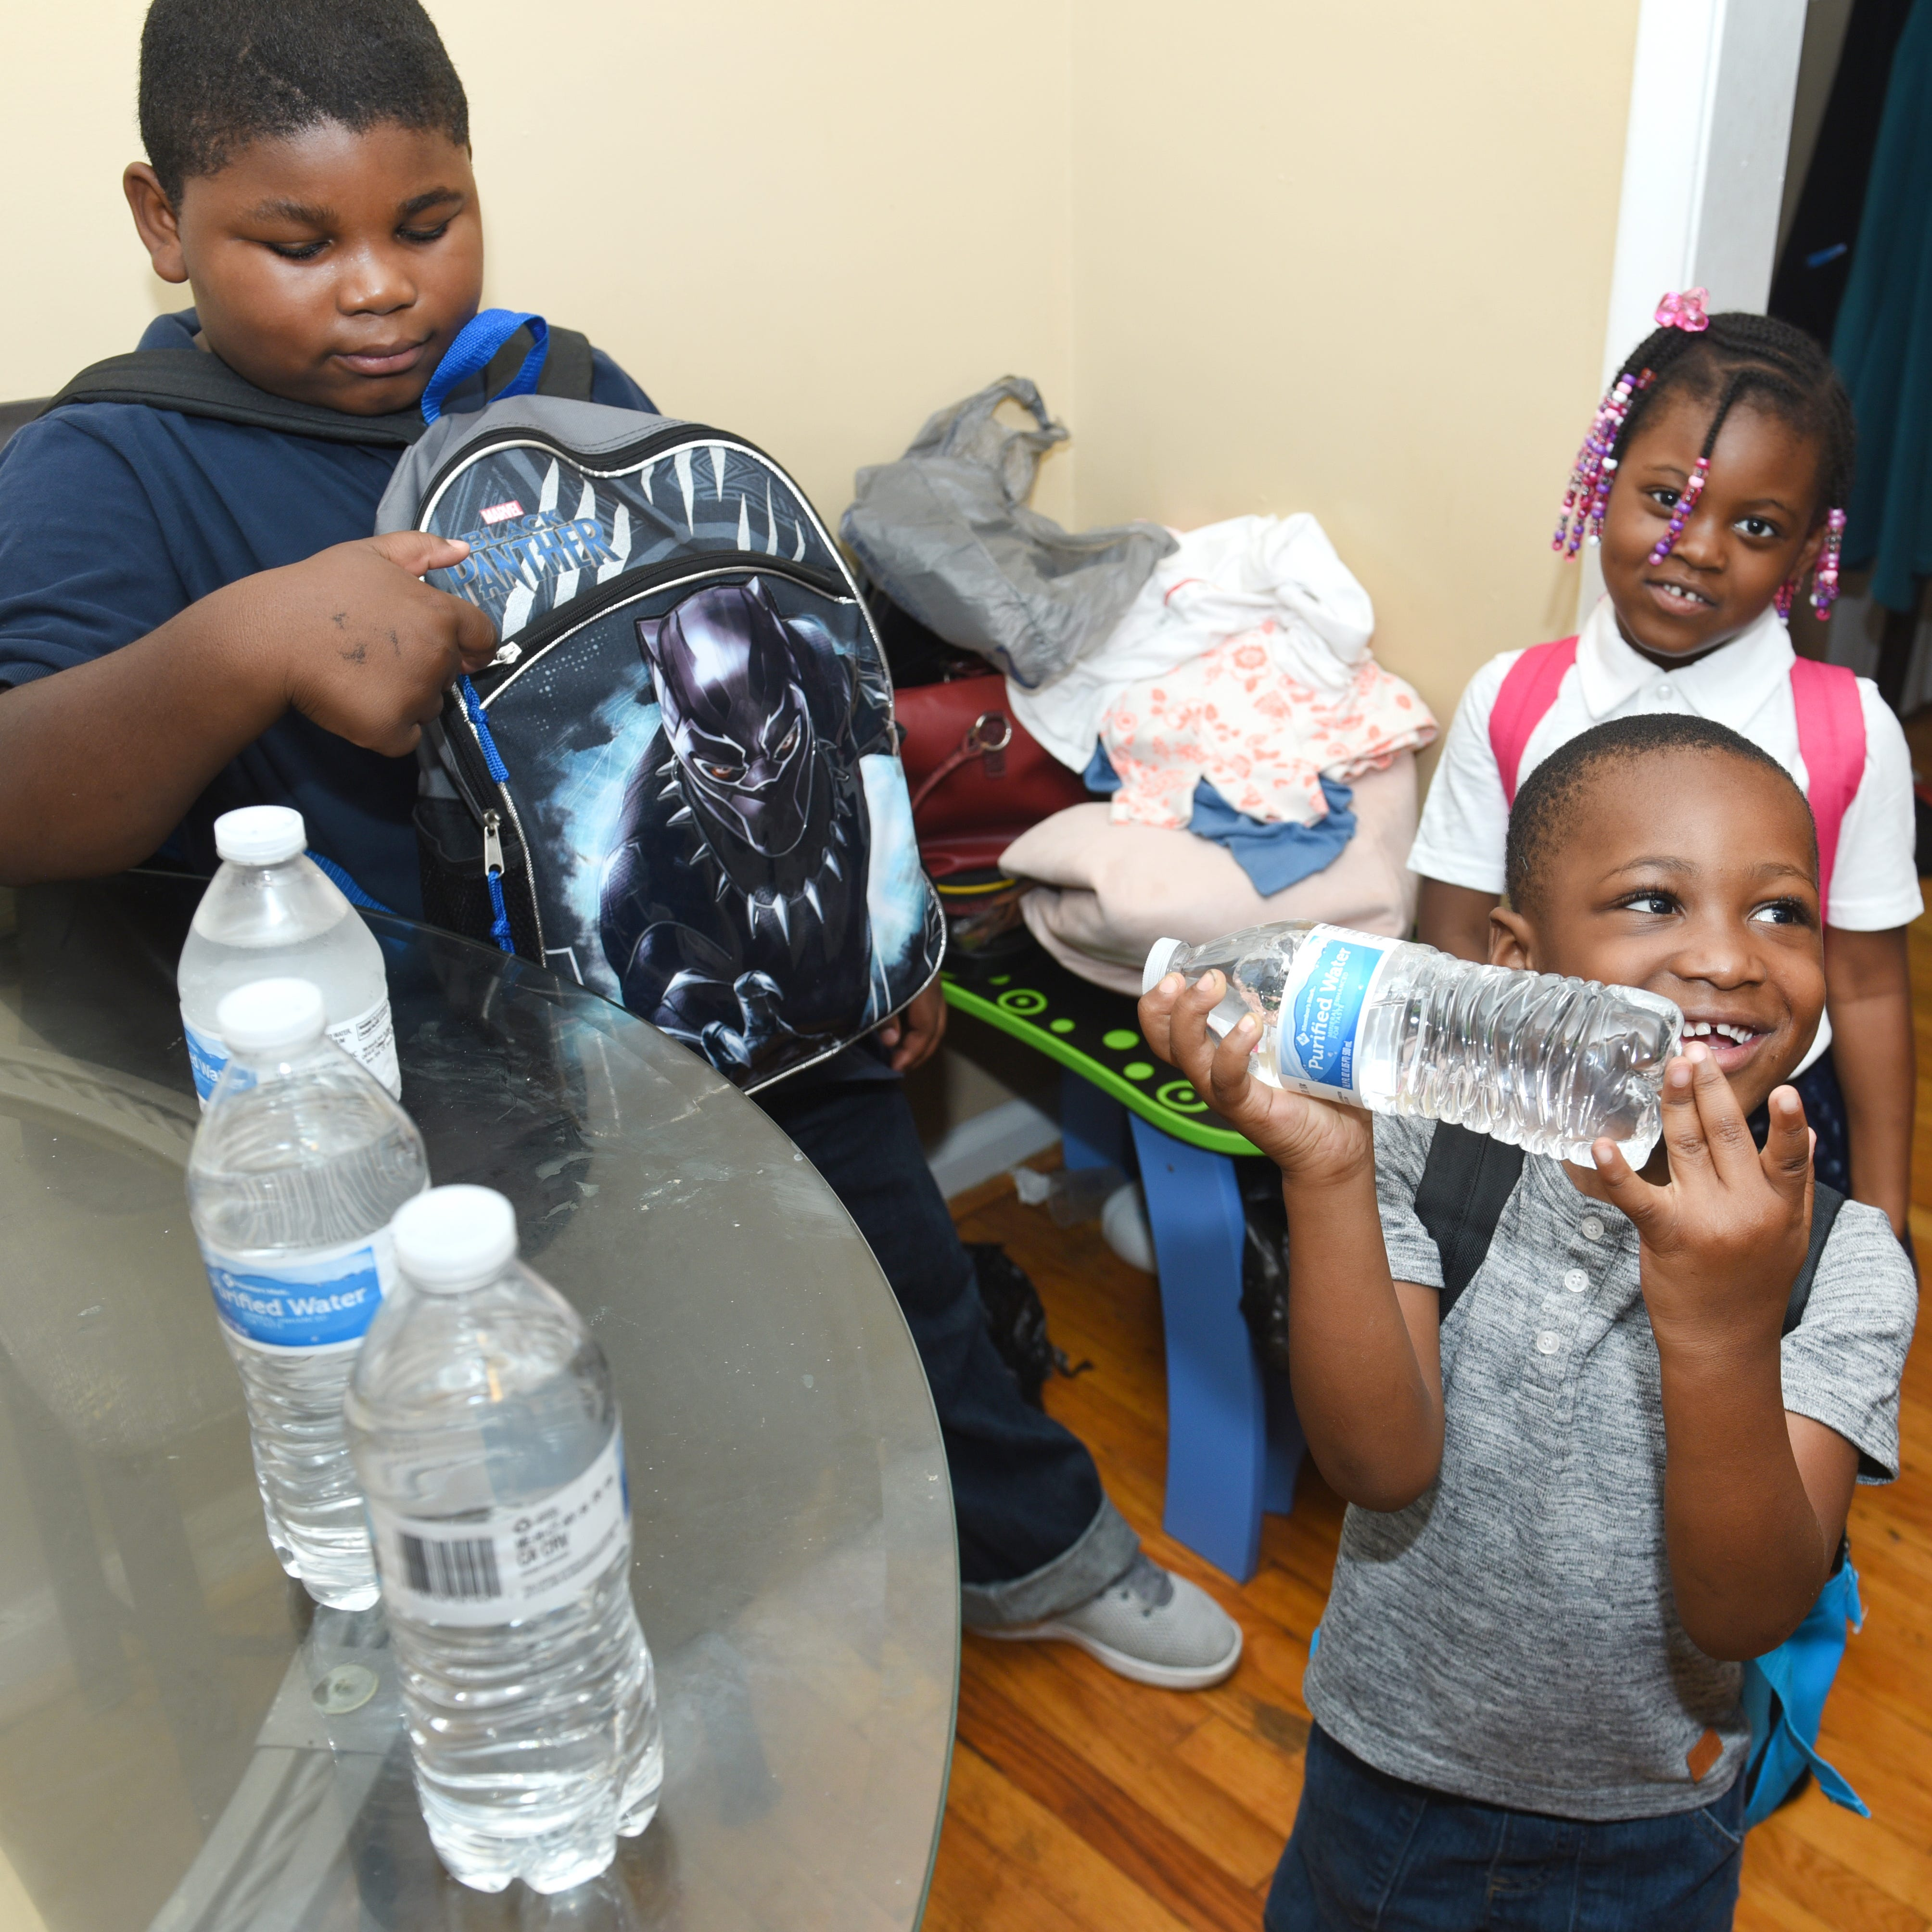 Bottled water among school supplies for Detroit, Flint kids